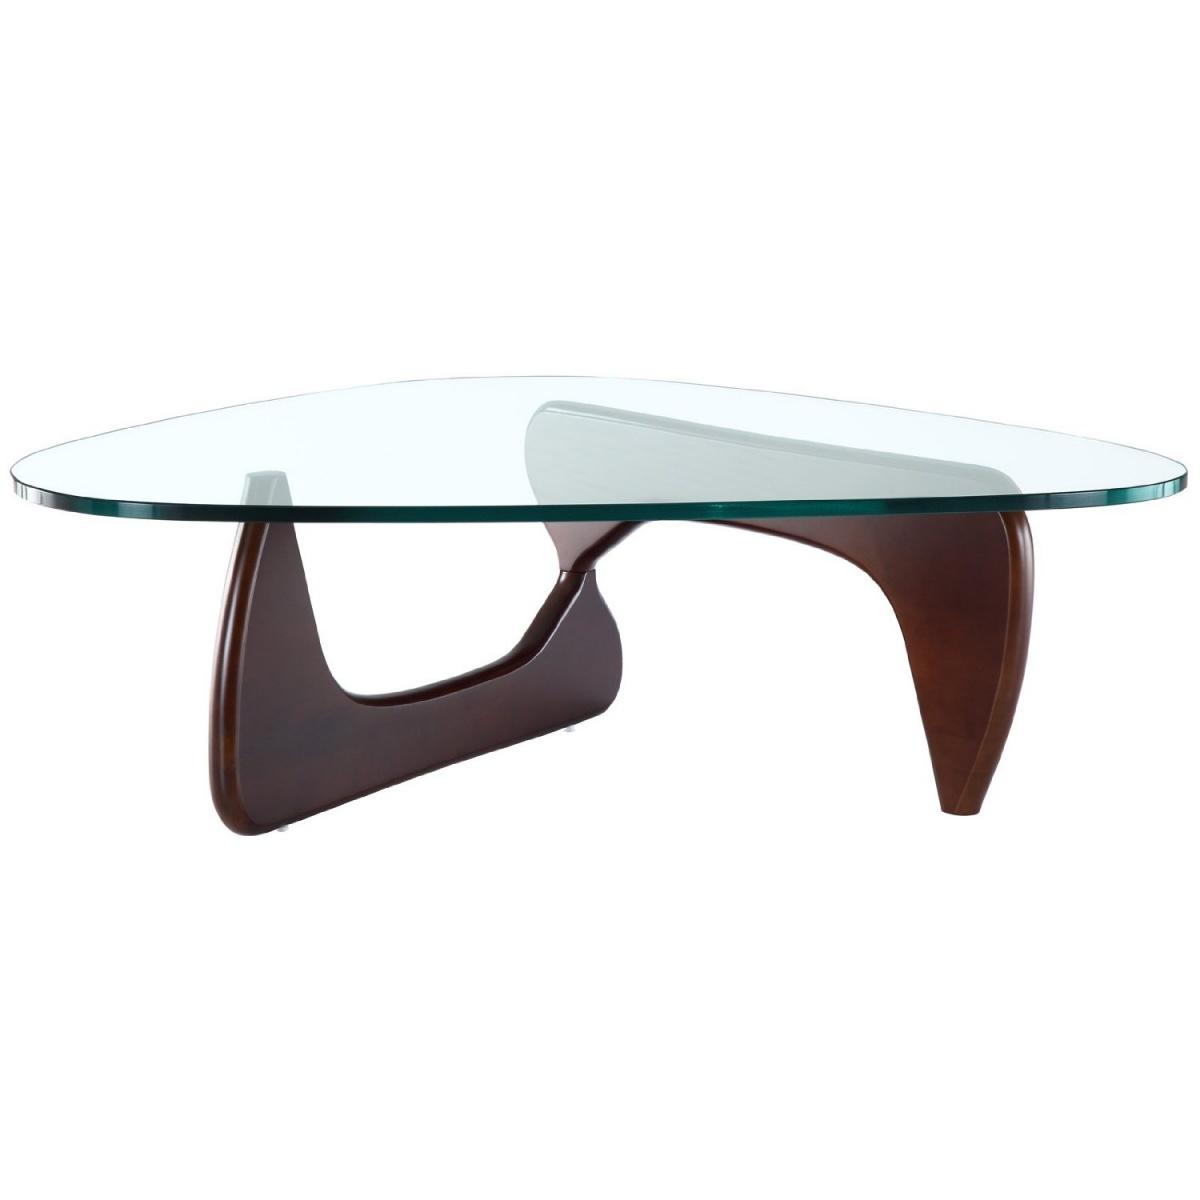 2017 best of modern wood coffee tables